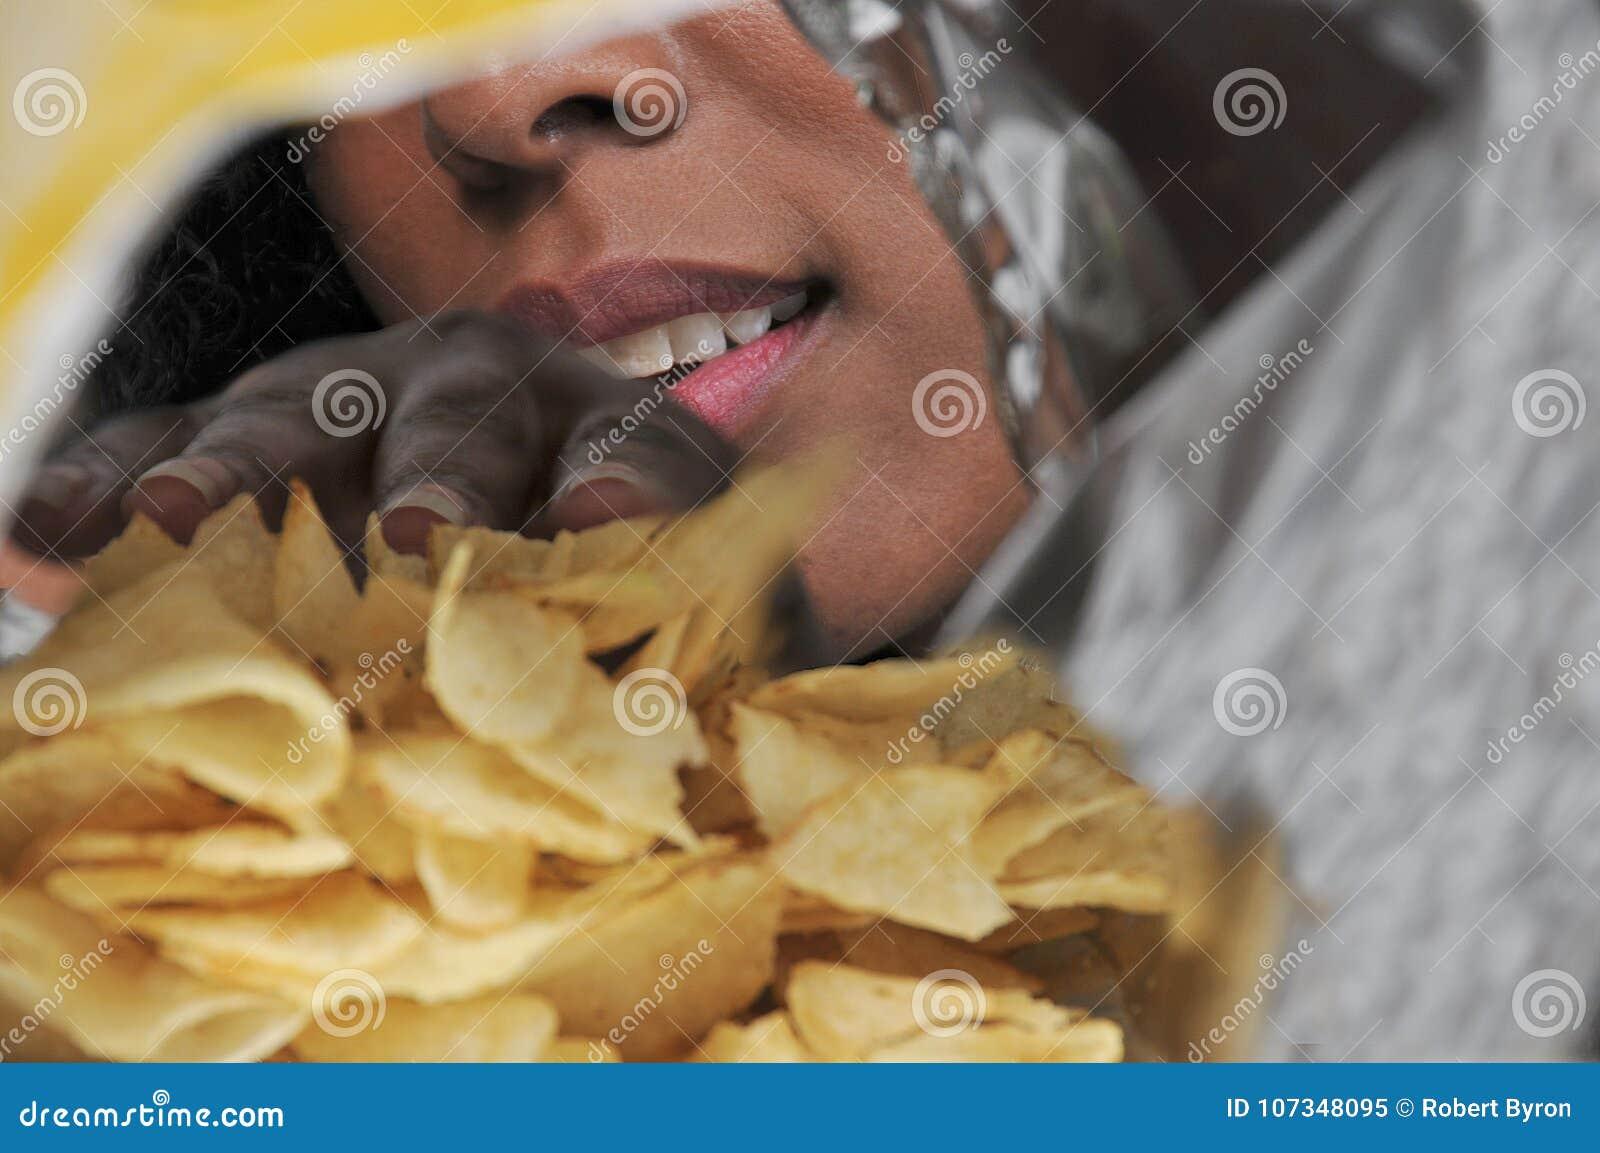 Woman eating potato chips